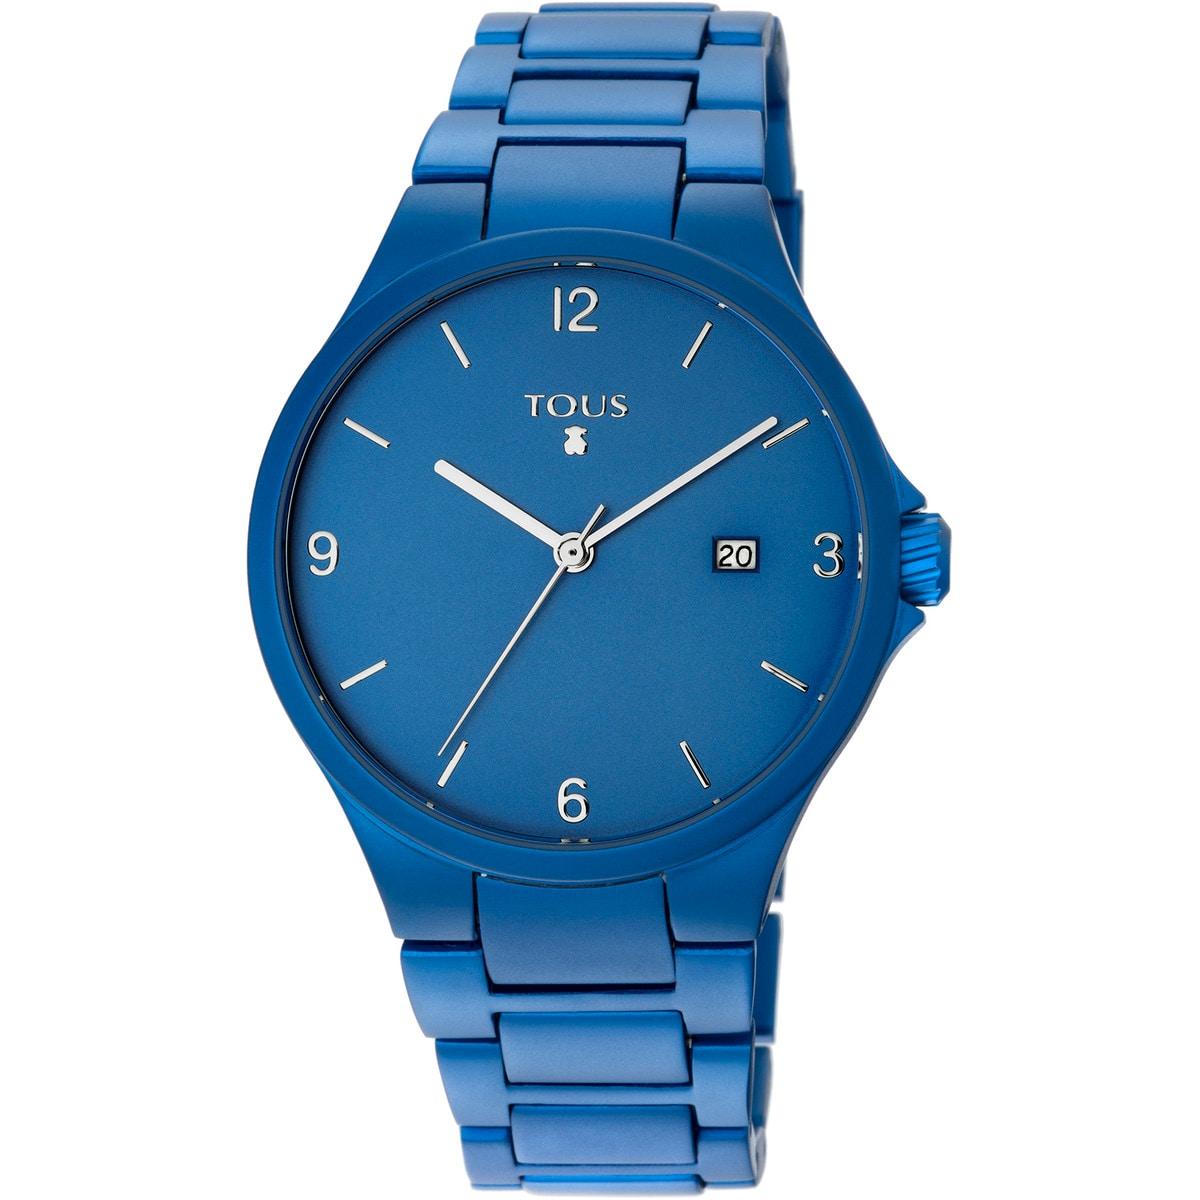 Reloj Motion Aluminio de aluminio anodizado azul